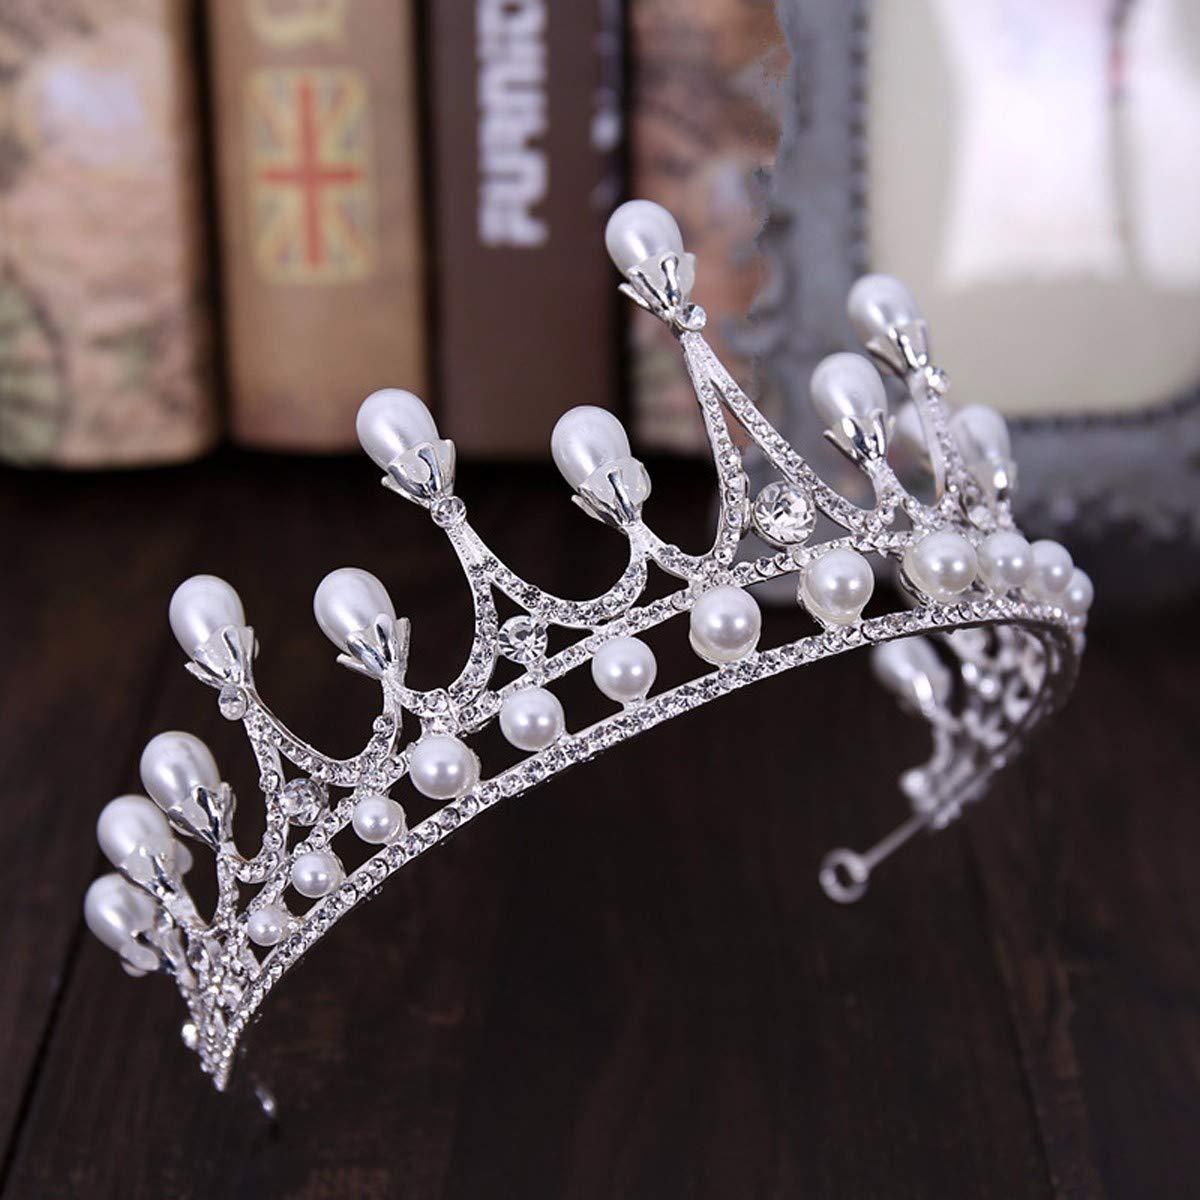 Wedding Crown, Beautiful headdress/Bridal Ornaments Crown Jewellery Wedding Dress Accessories by Junson (Image #2)